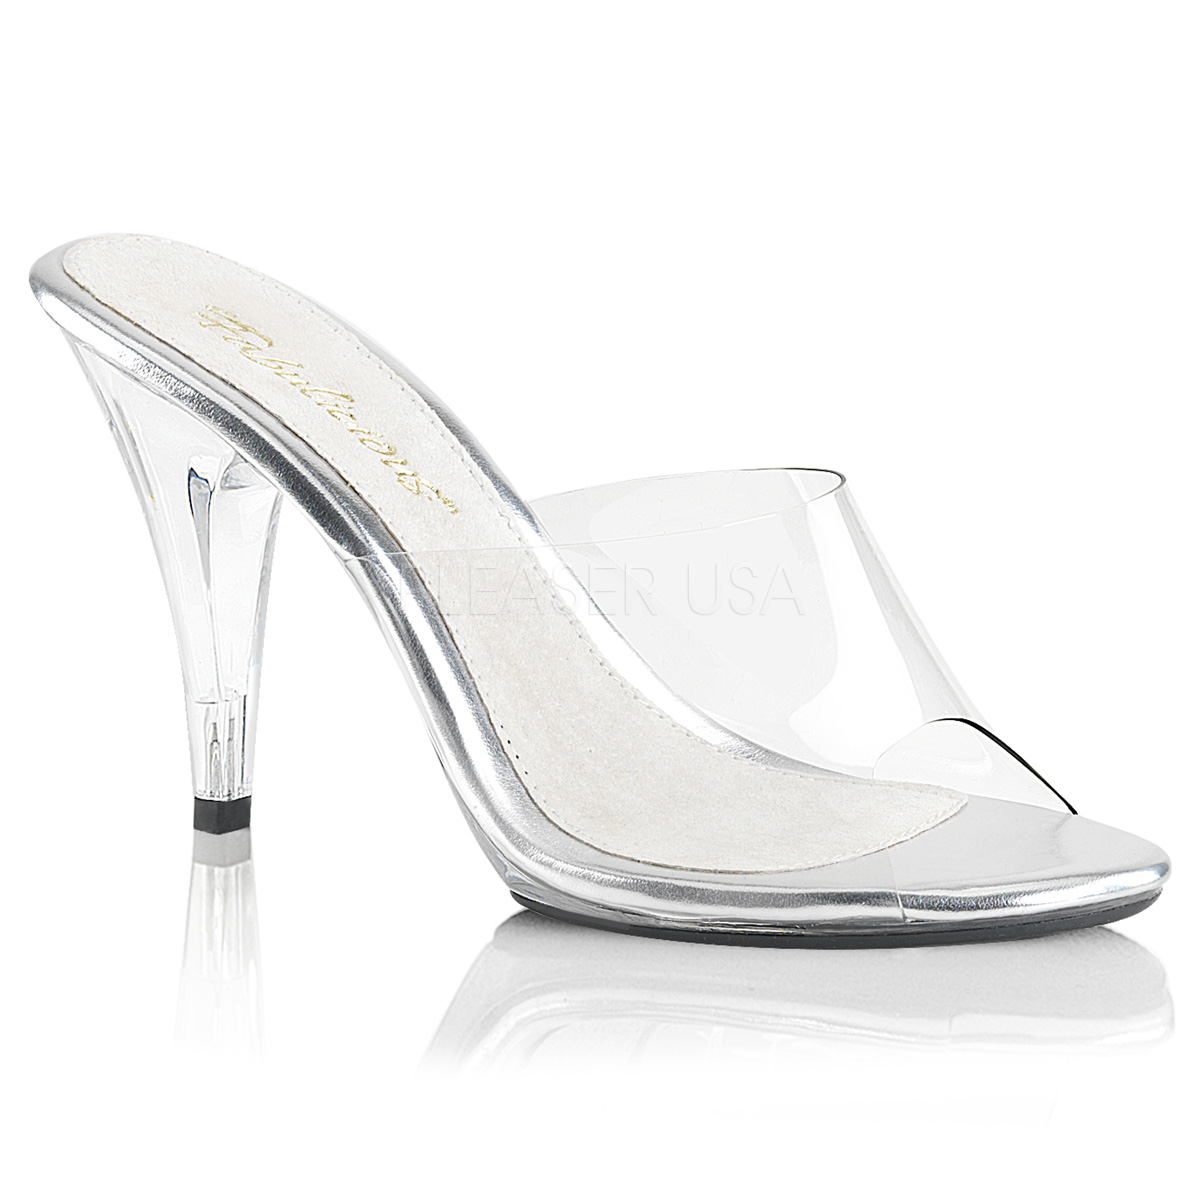 Caress 401 Posing Shoes with no platform